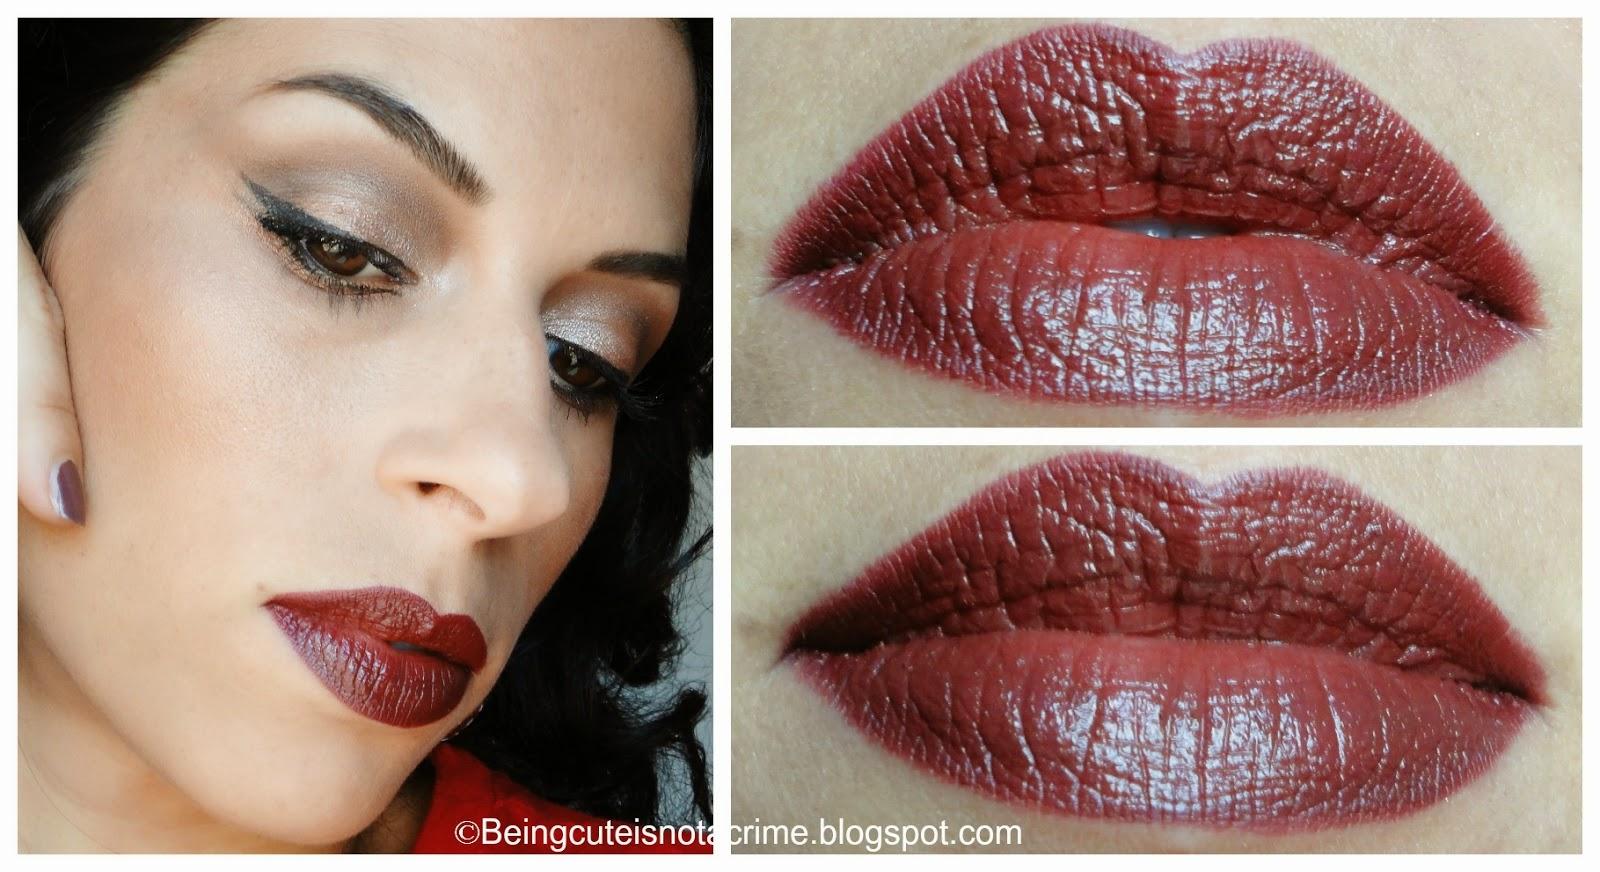 http://beingcuteisnotacrime.blogspot.nl/2014/10/make-up-serie-matchy-matchy-11.html